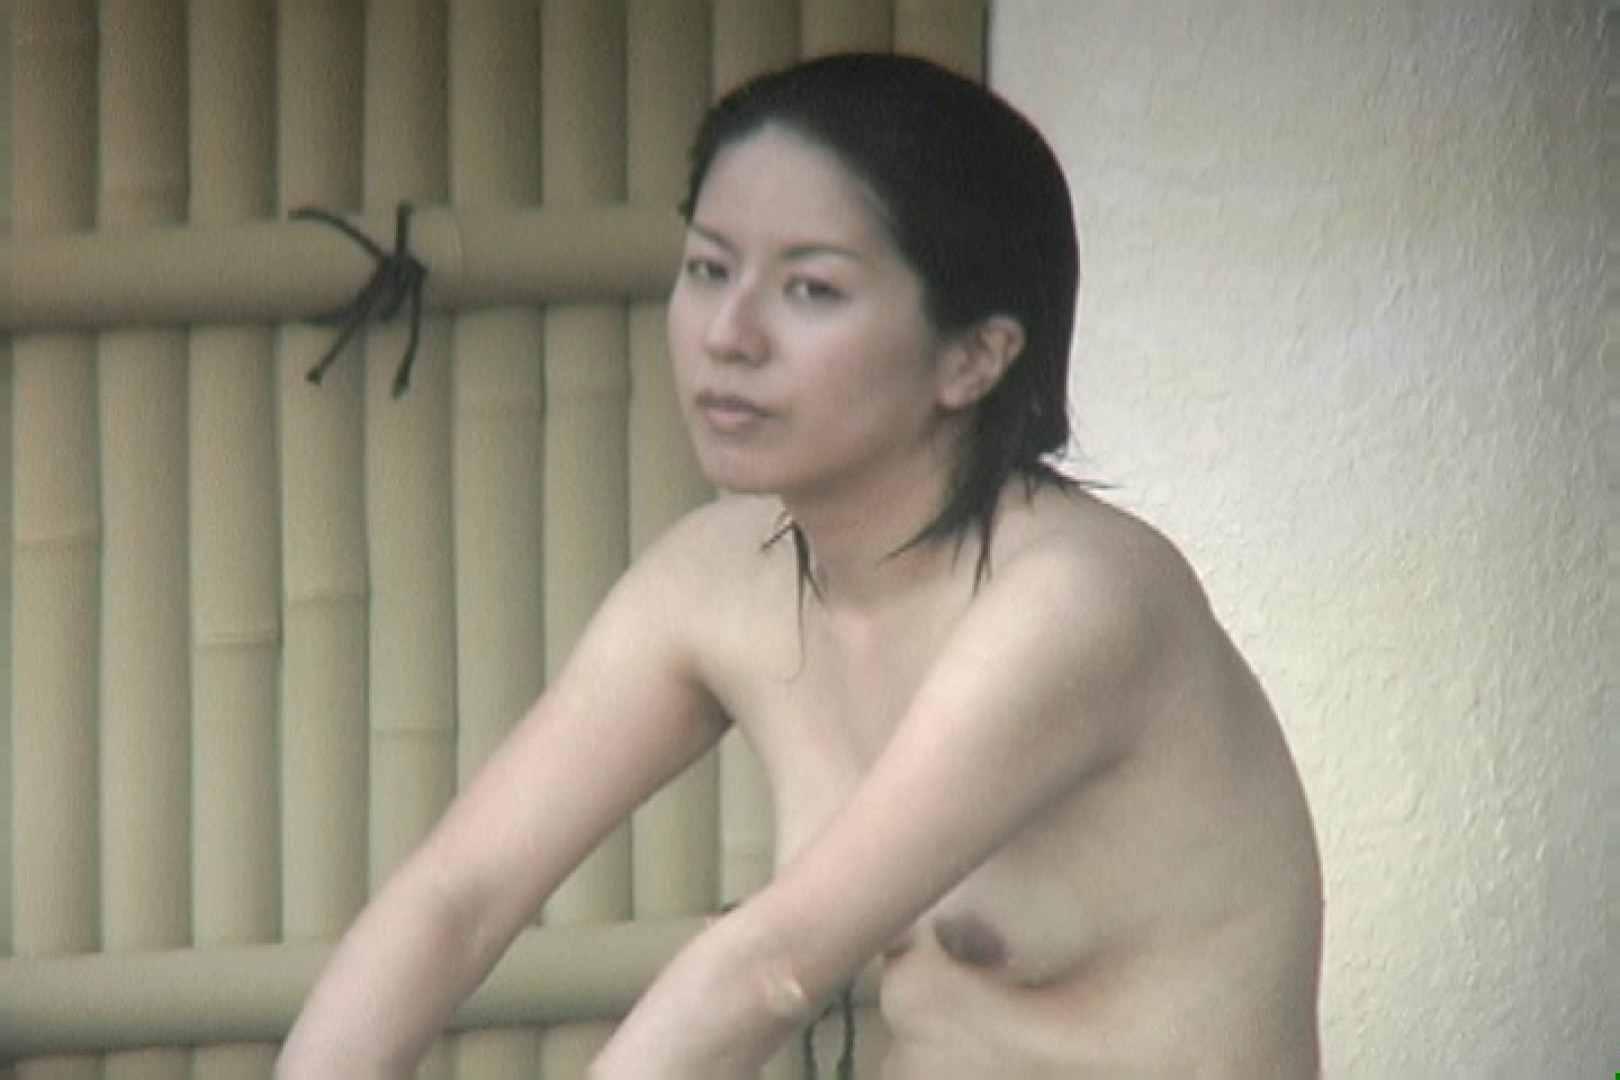 Aquaな露天風呂Vol.694 盗撮 | OLエロ画像  110PICs 22